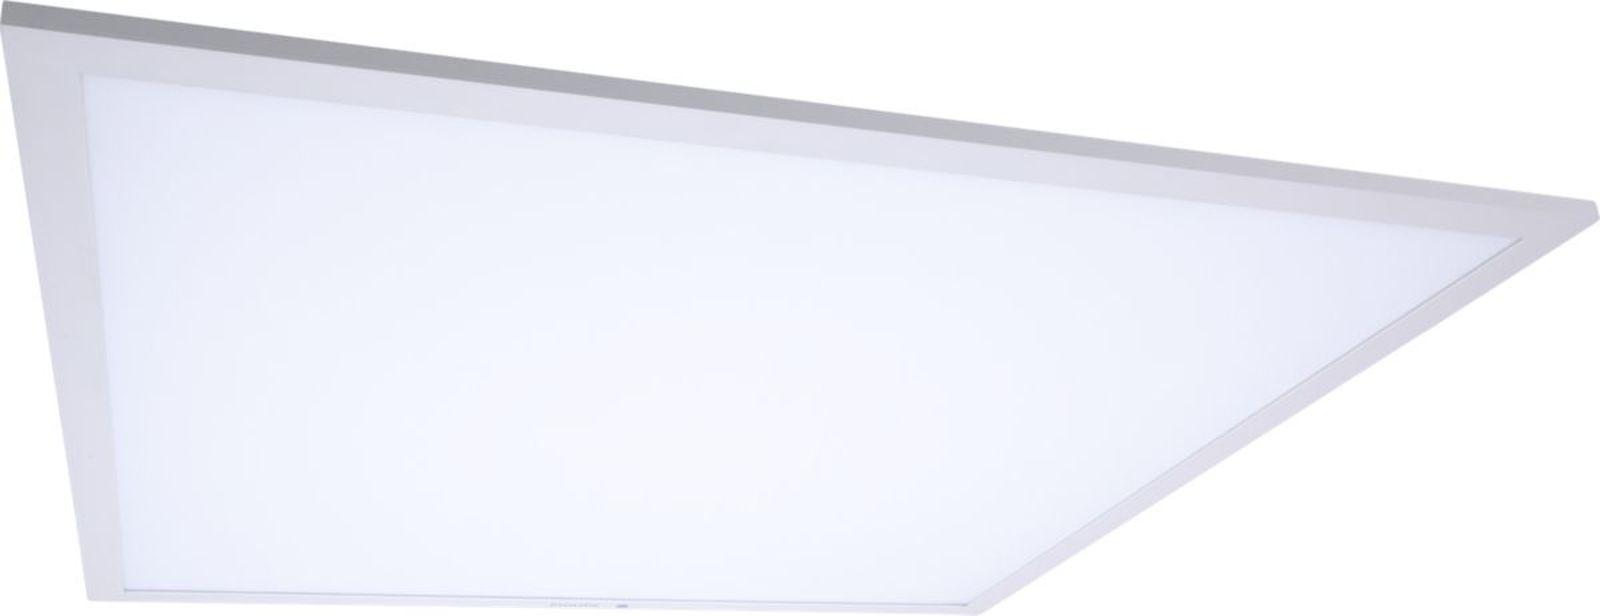 Потолочный светильник Philips TradeLine RC091V LED34S/865 PSU W60L60 RU, 34 Вт philips ru